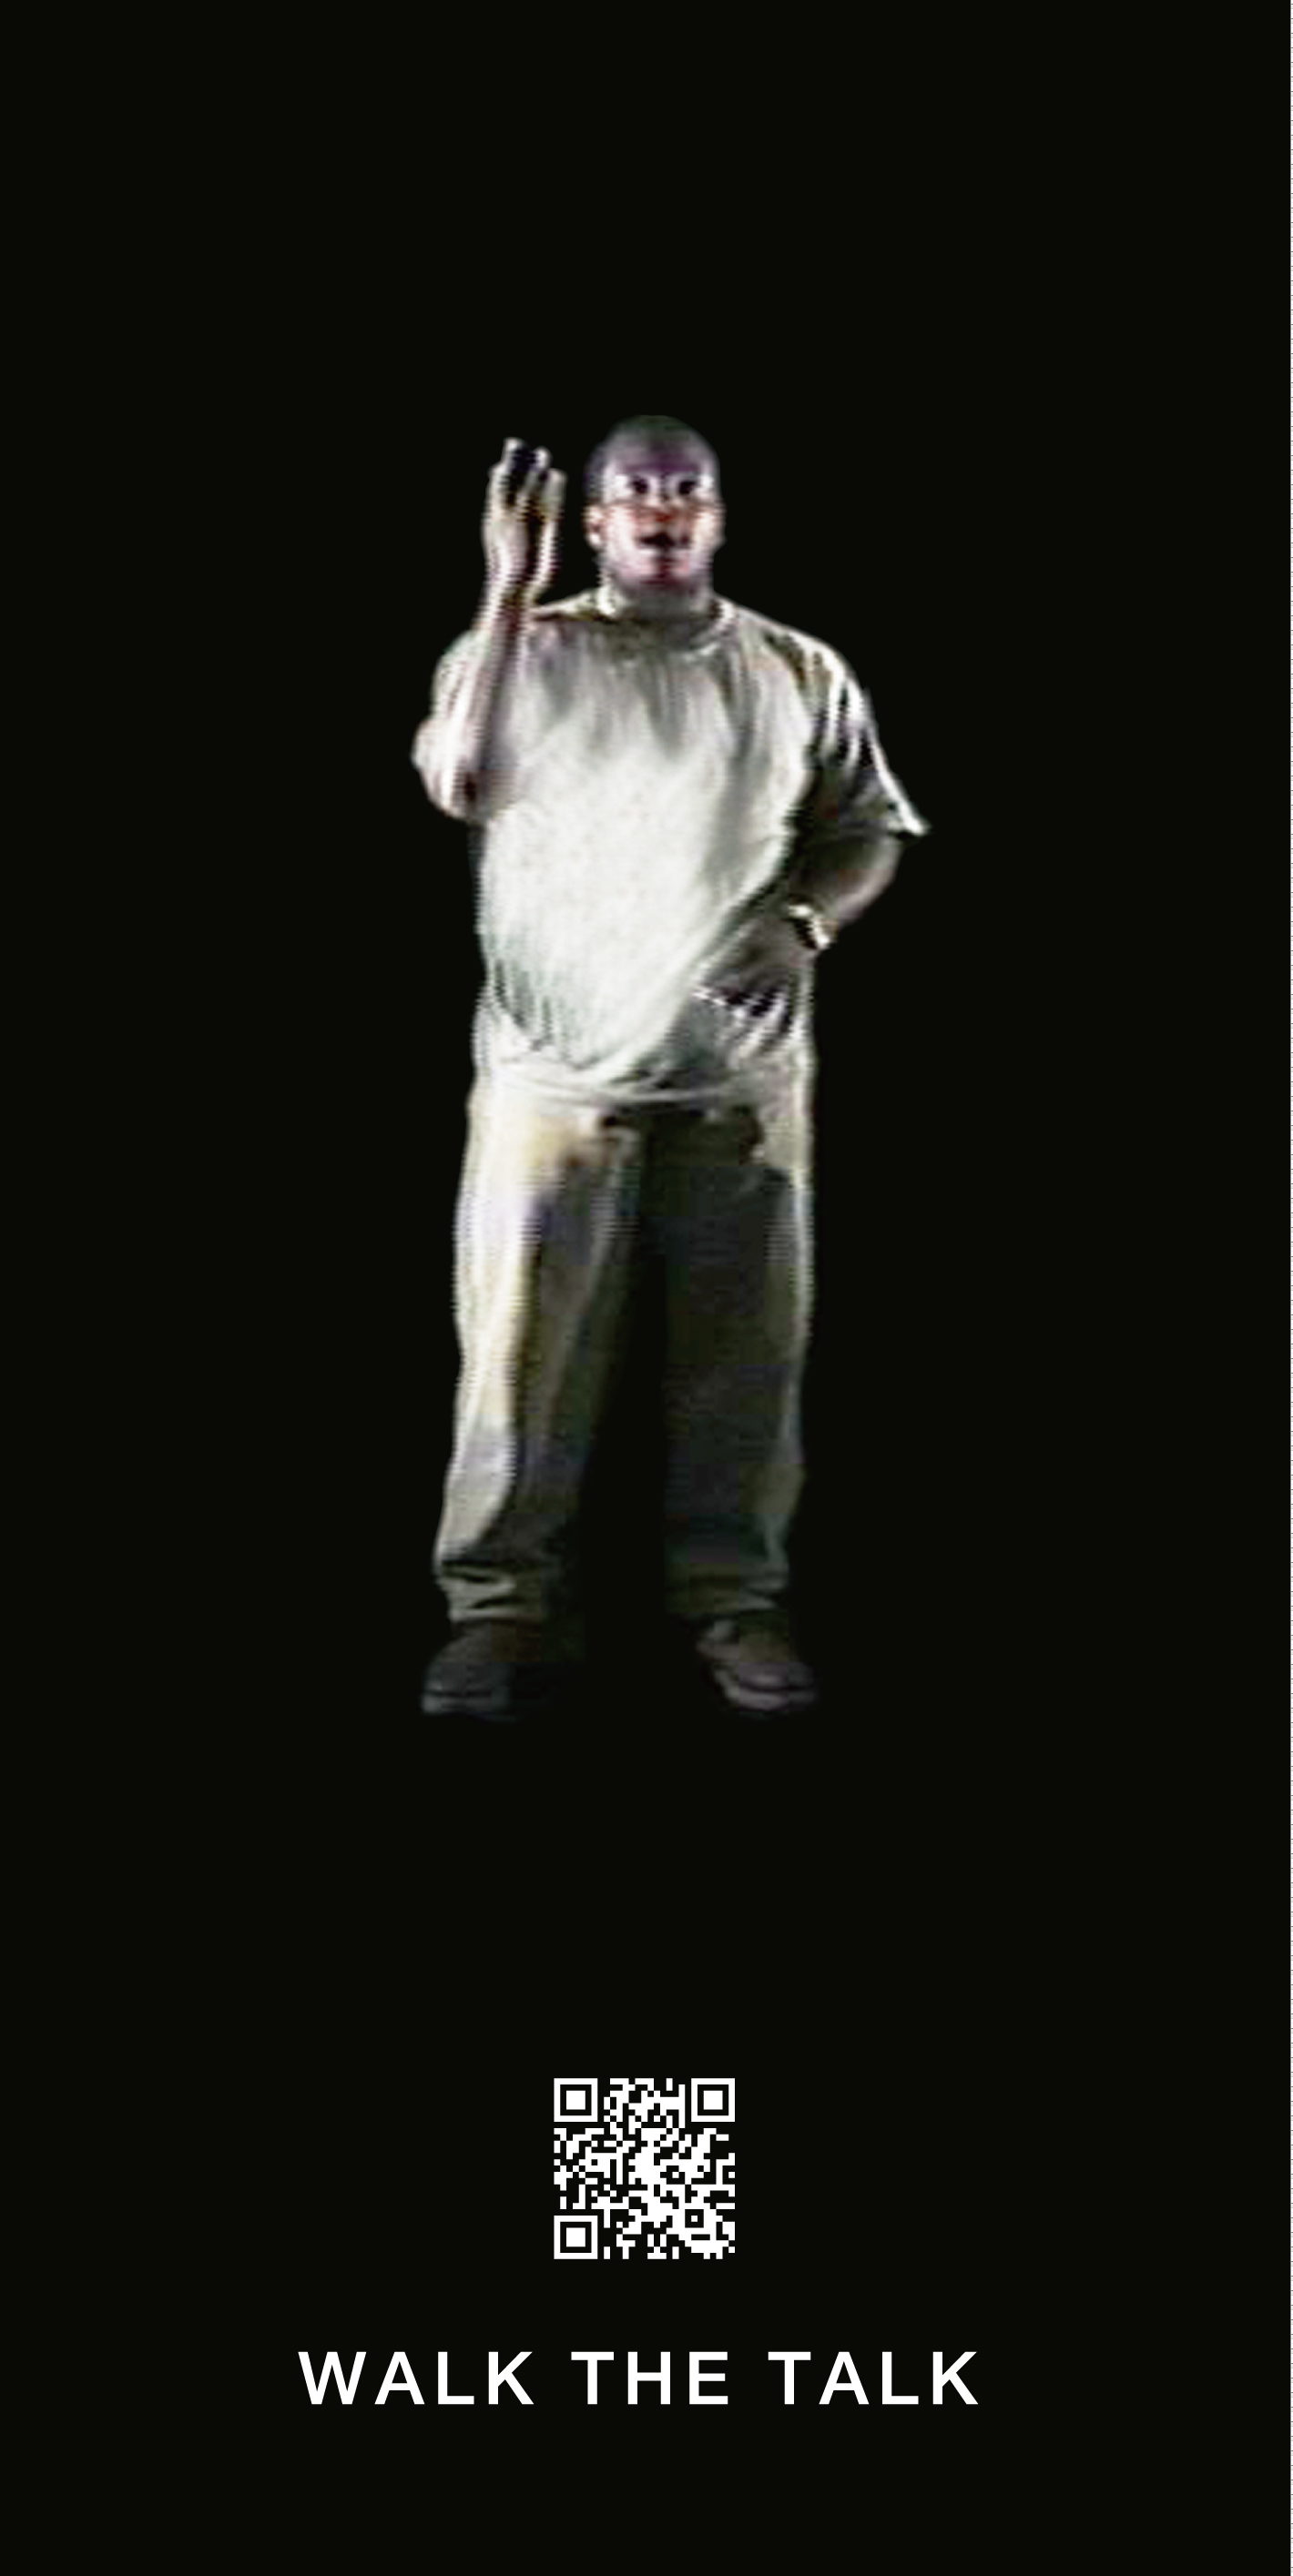 【終了】4.21-7.15 金沢アートグミ10周年記念個展 坂野充学 WALK THE TALK